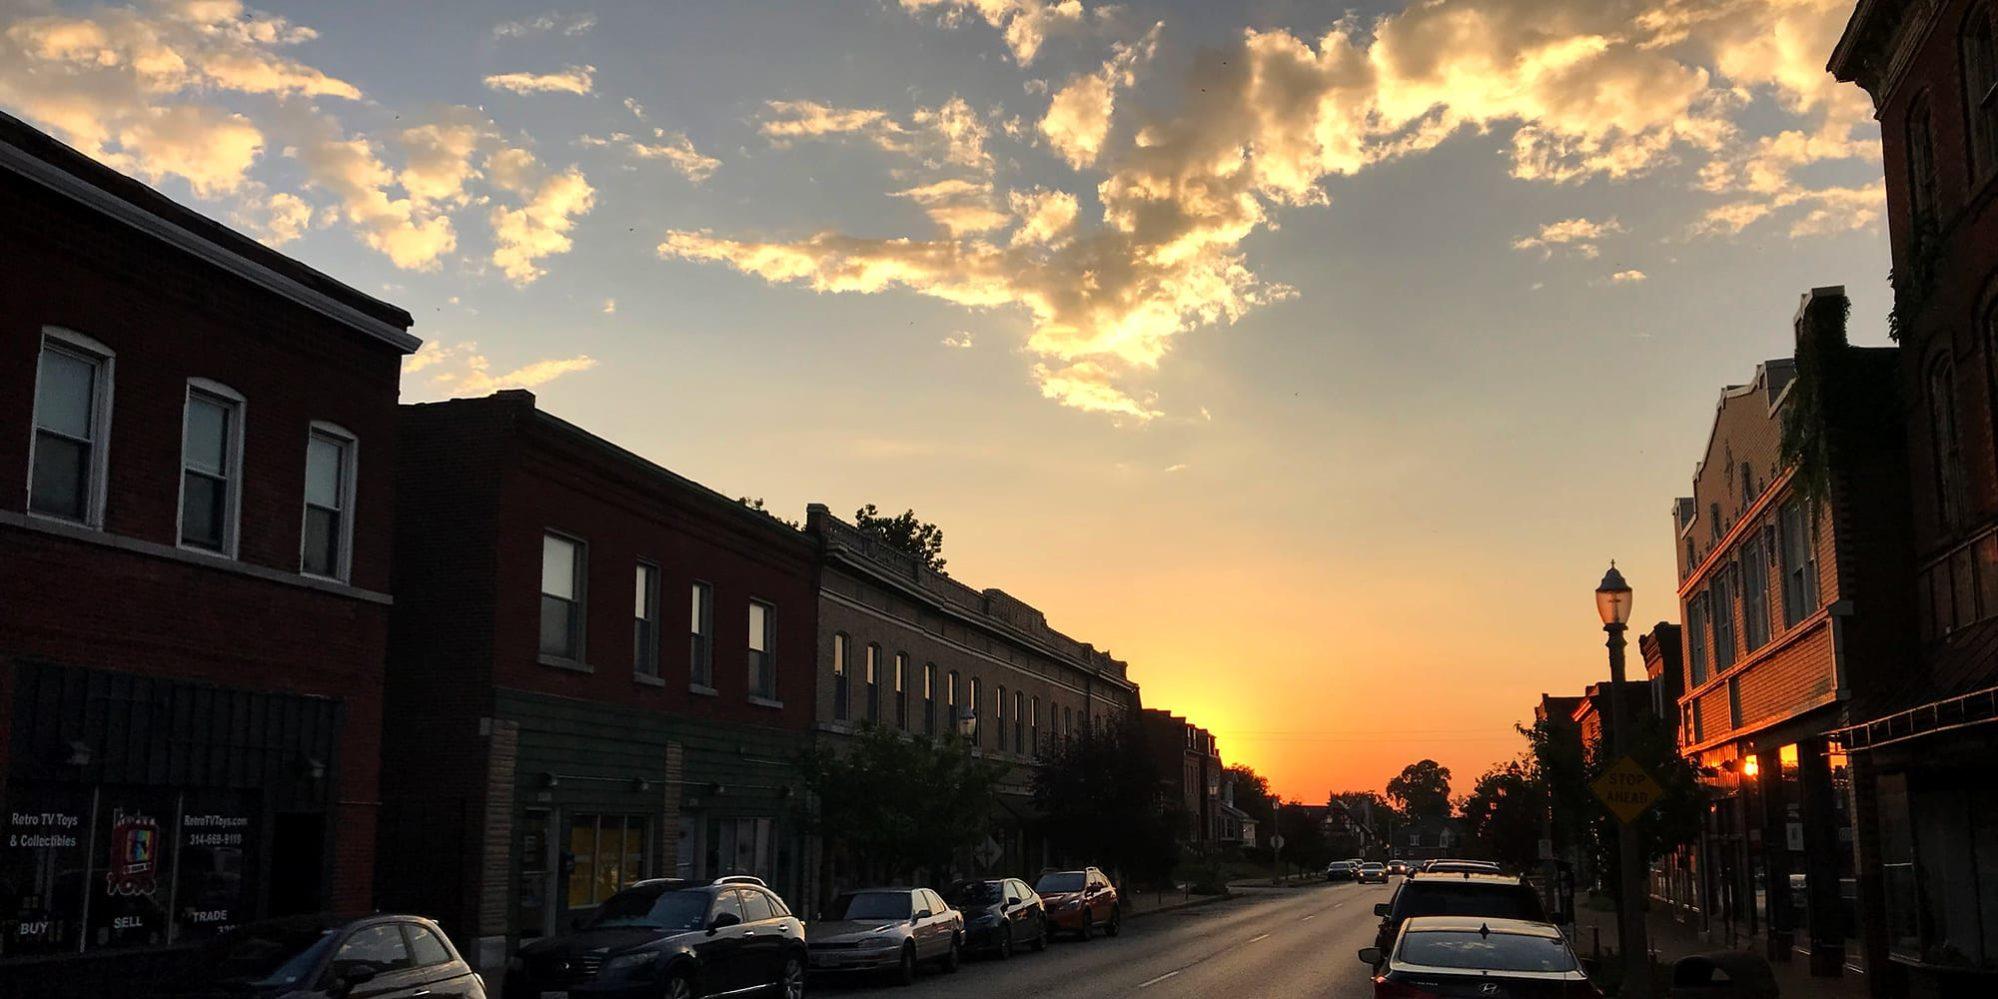 The sun setting over Meramec Street in Downtown Dutchtown, St. Louis, MO.